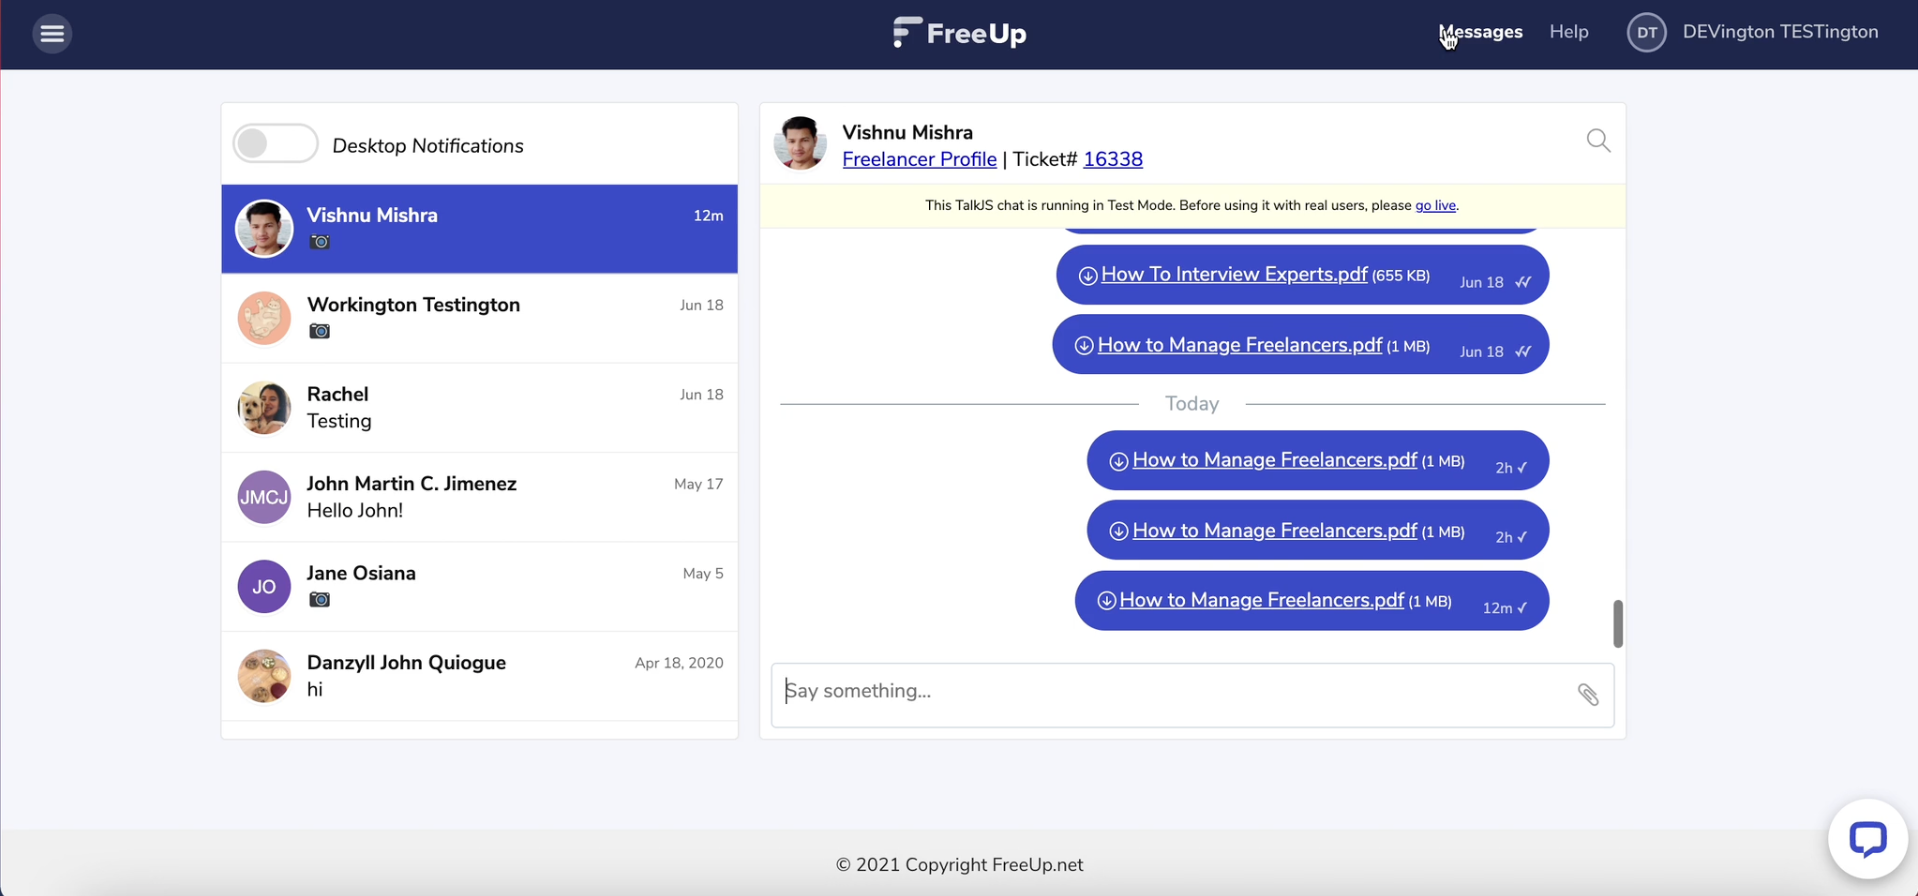 FreeUp Messenger inbox